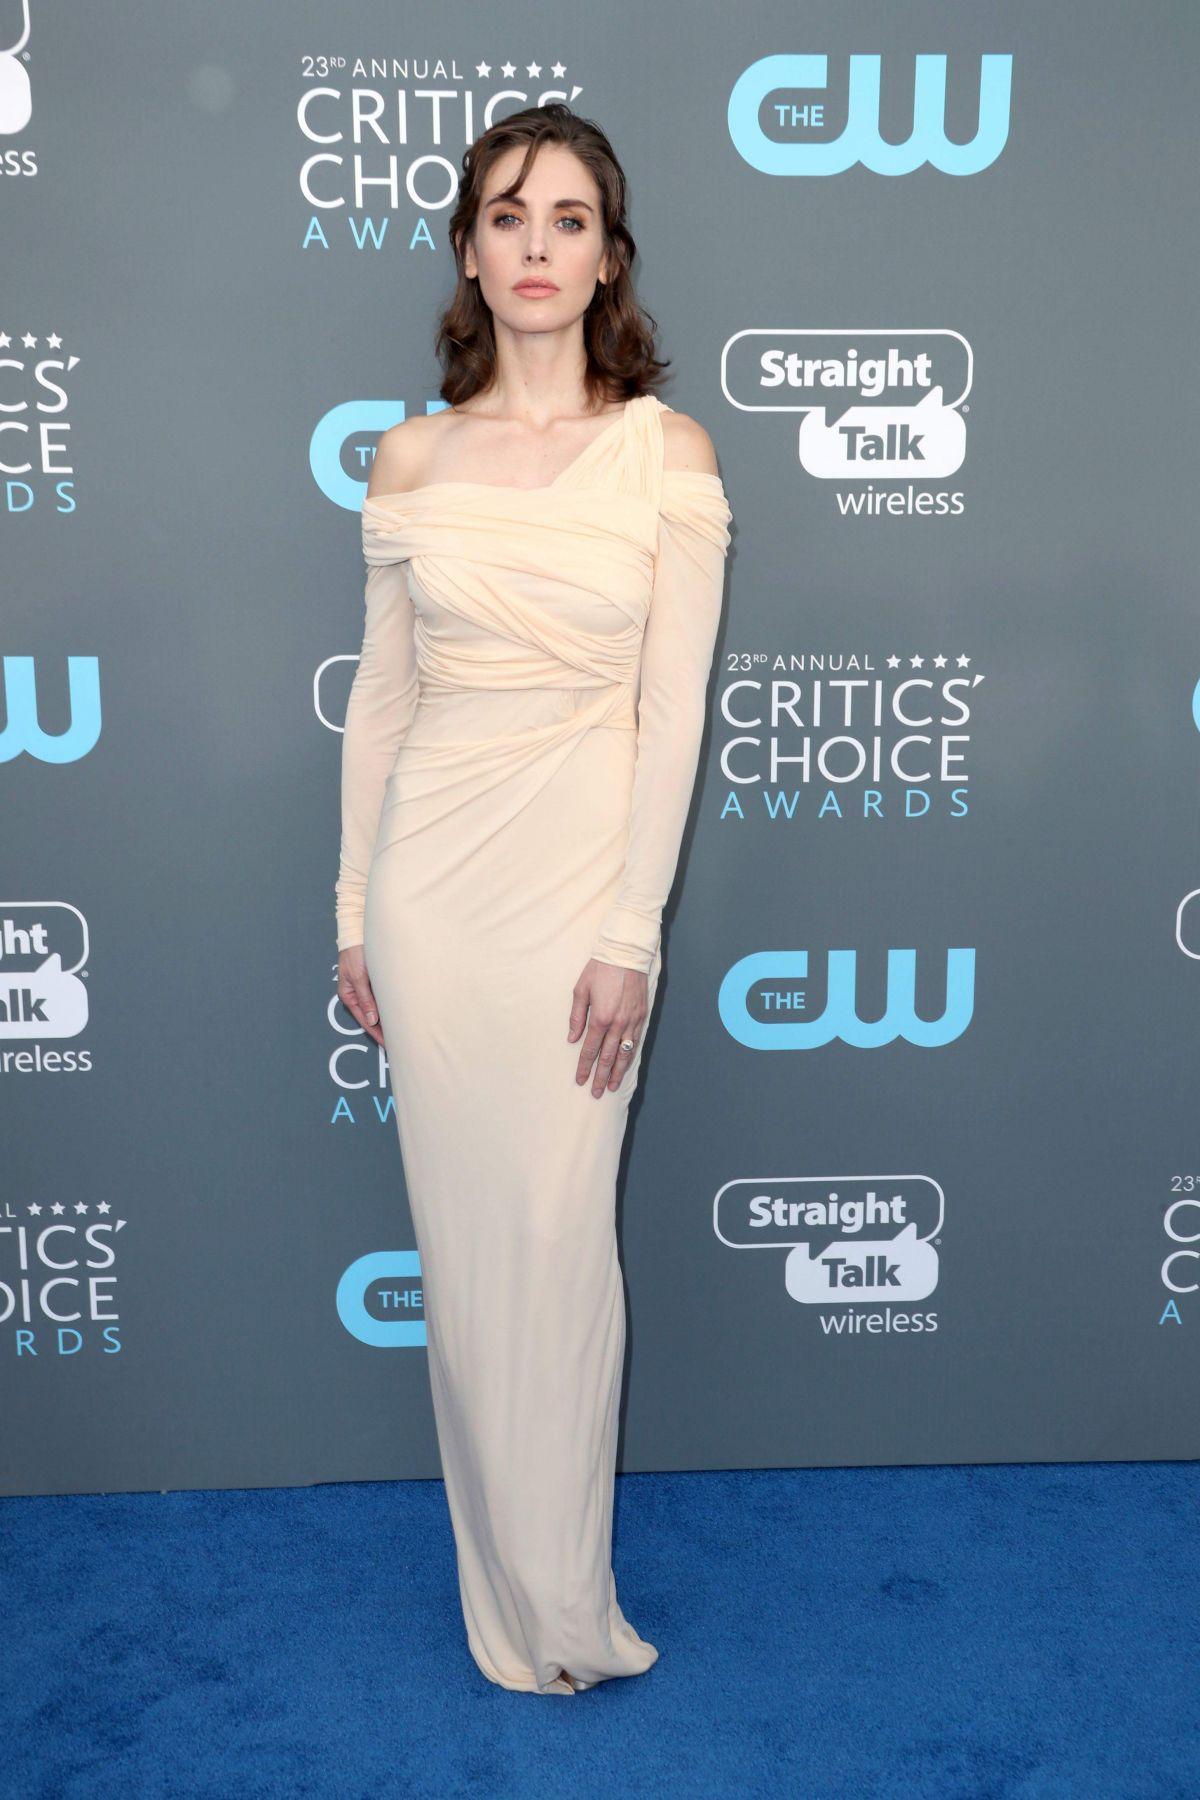 critics choice awards - photo #21